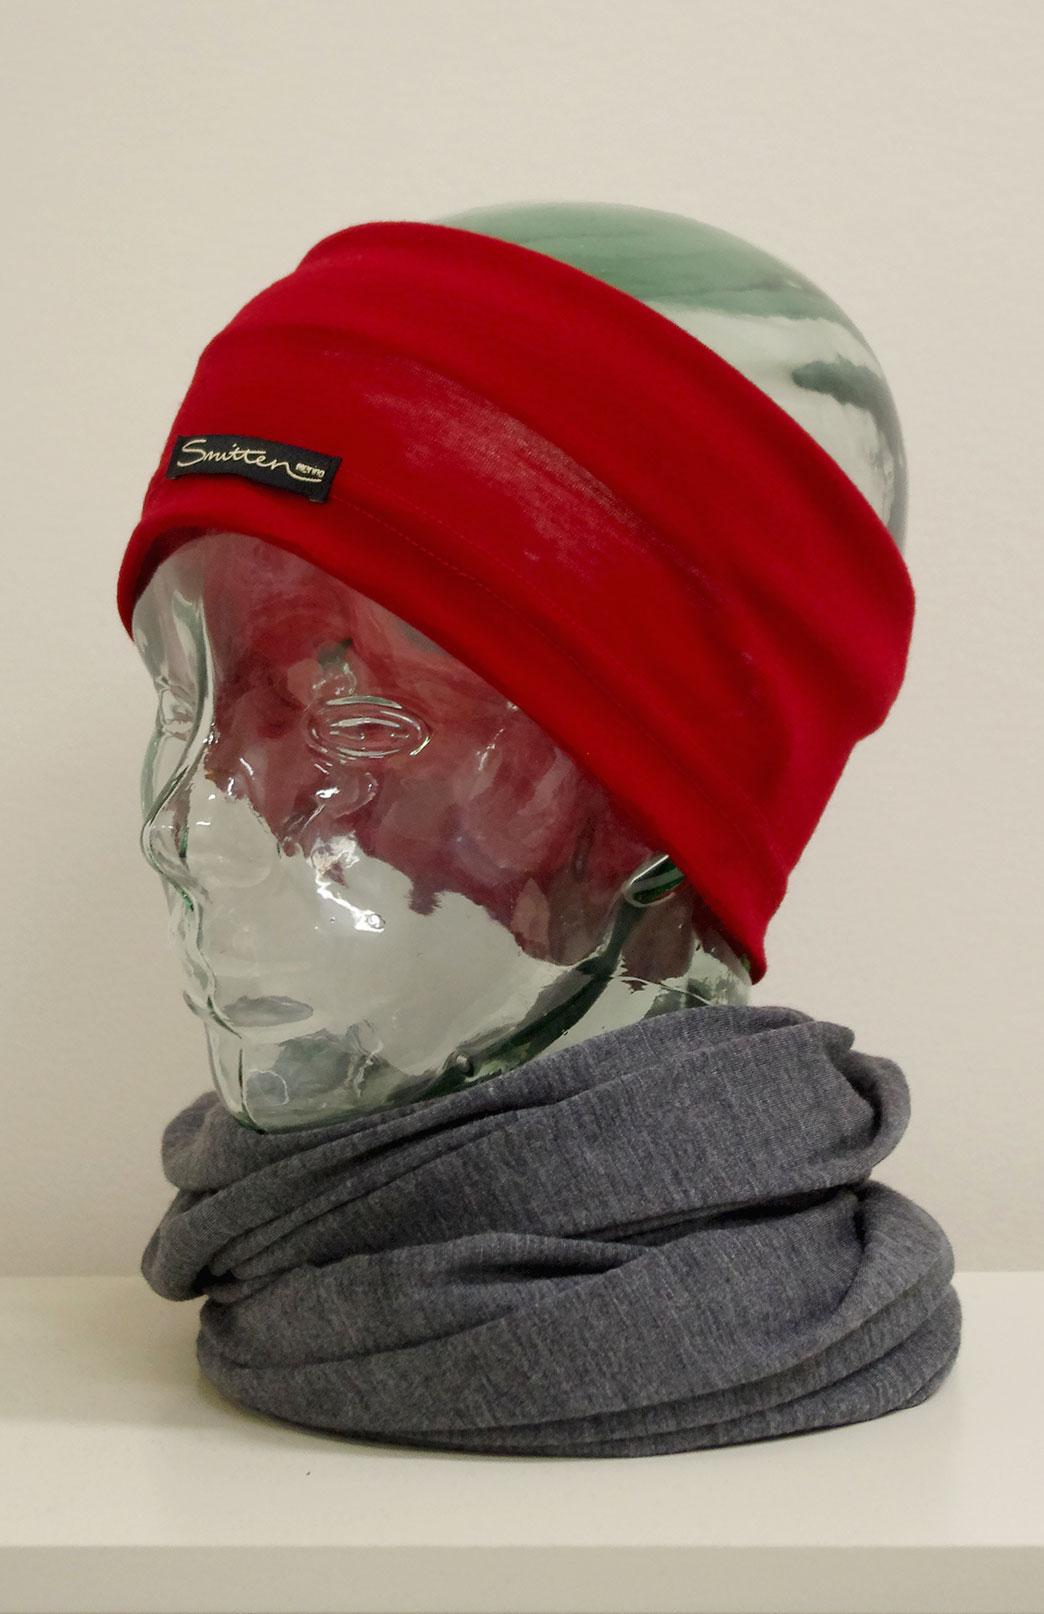 Headband / Ear Warmer - Unisex Chilli Red Merino Wool Headband and Ear Warmer - Smitten Merino Tasmania Australia